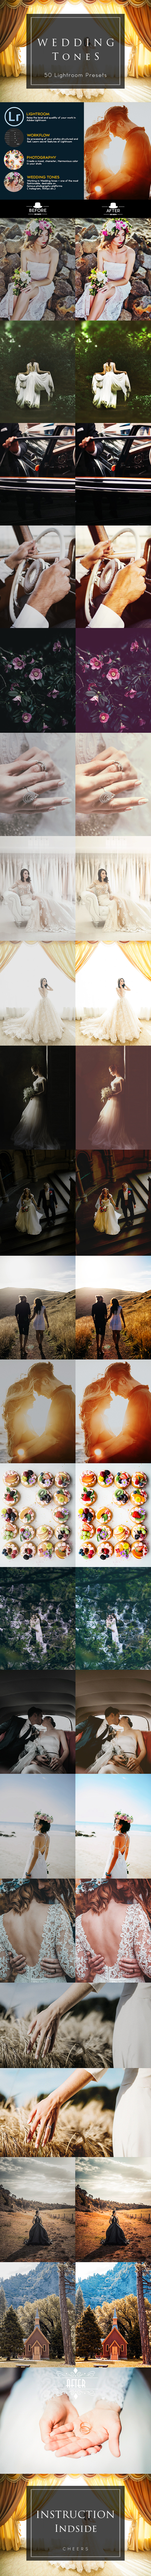 GraphicRiver Wedding Tones Lightroom Presets 20905491